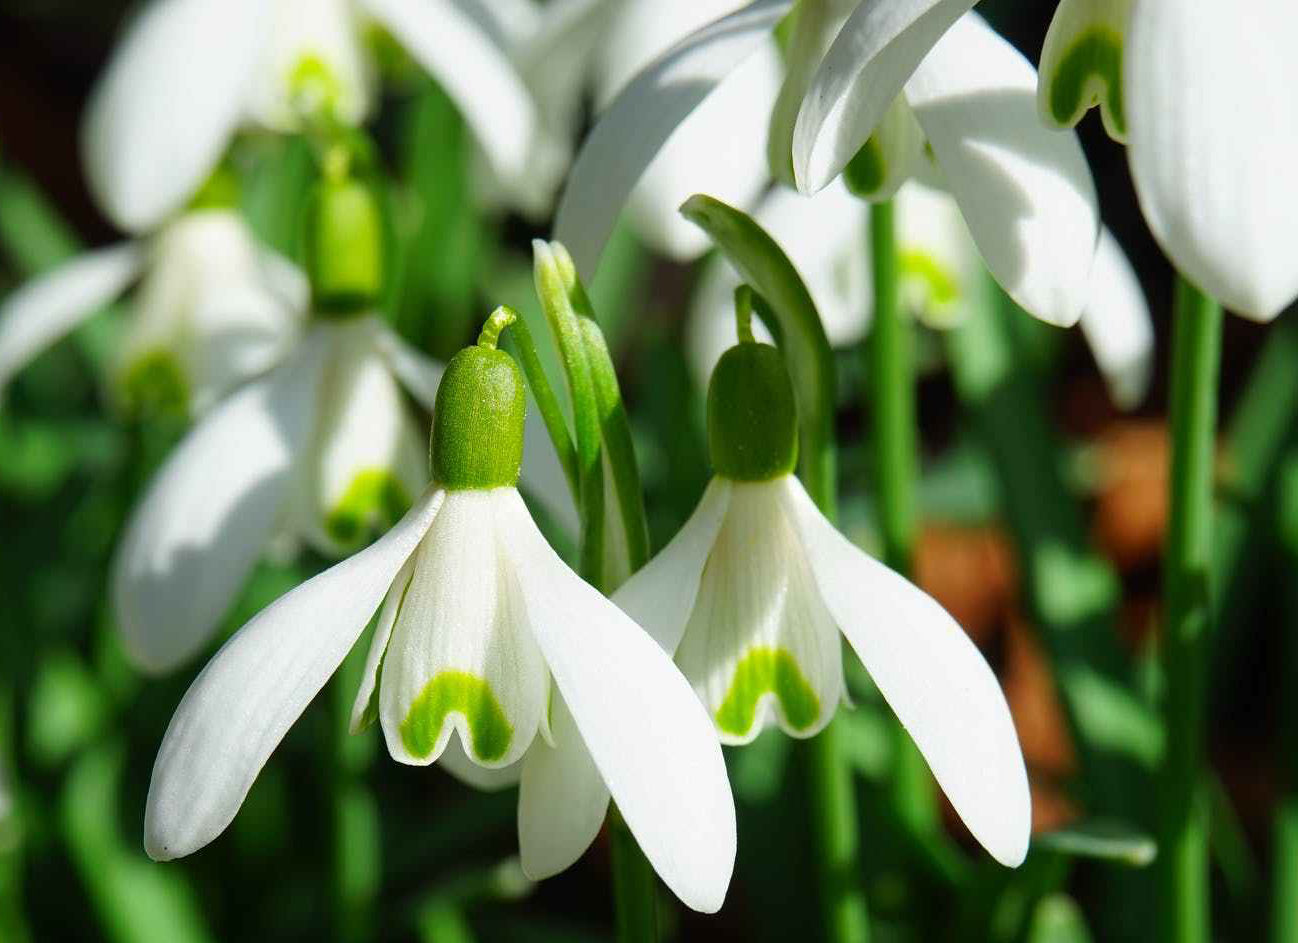 snowdrop-flowers-spring-flower-plant.jpg